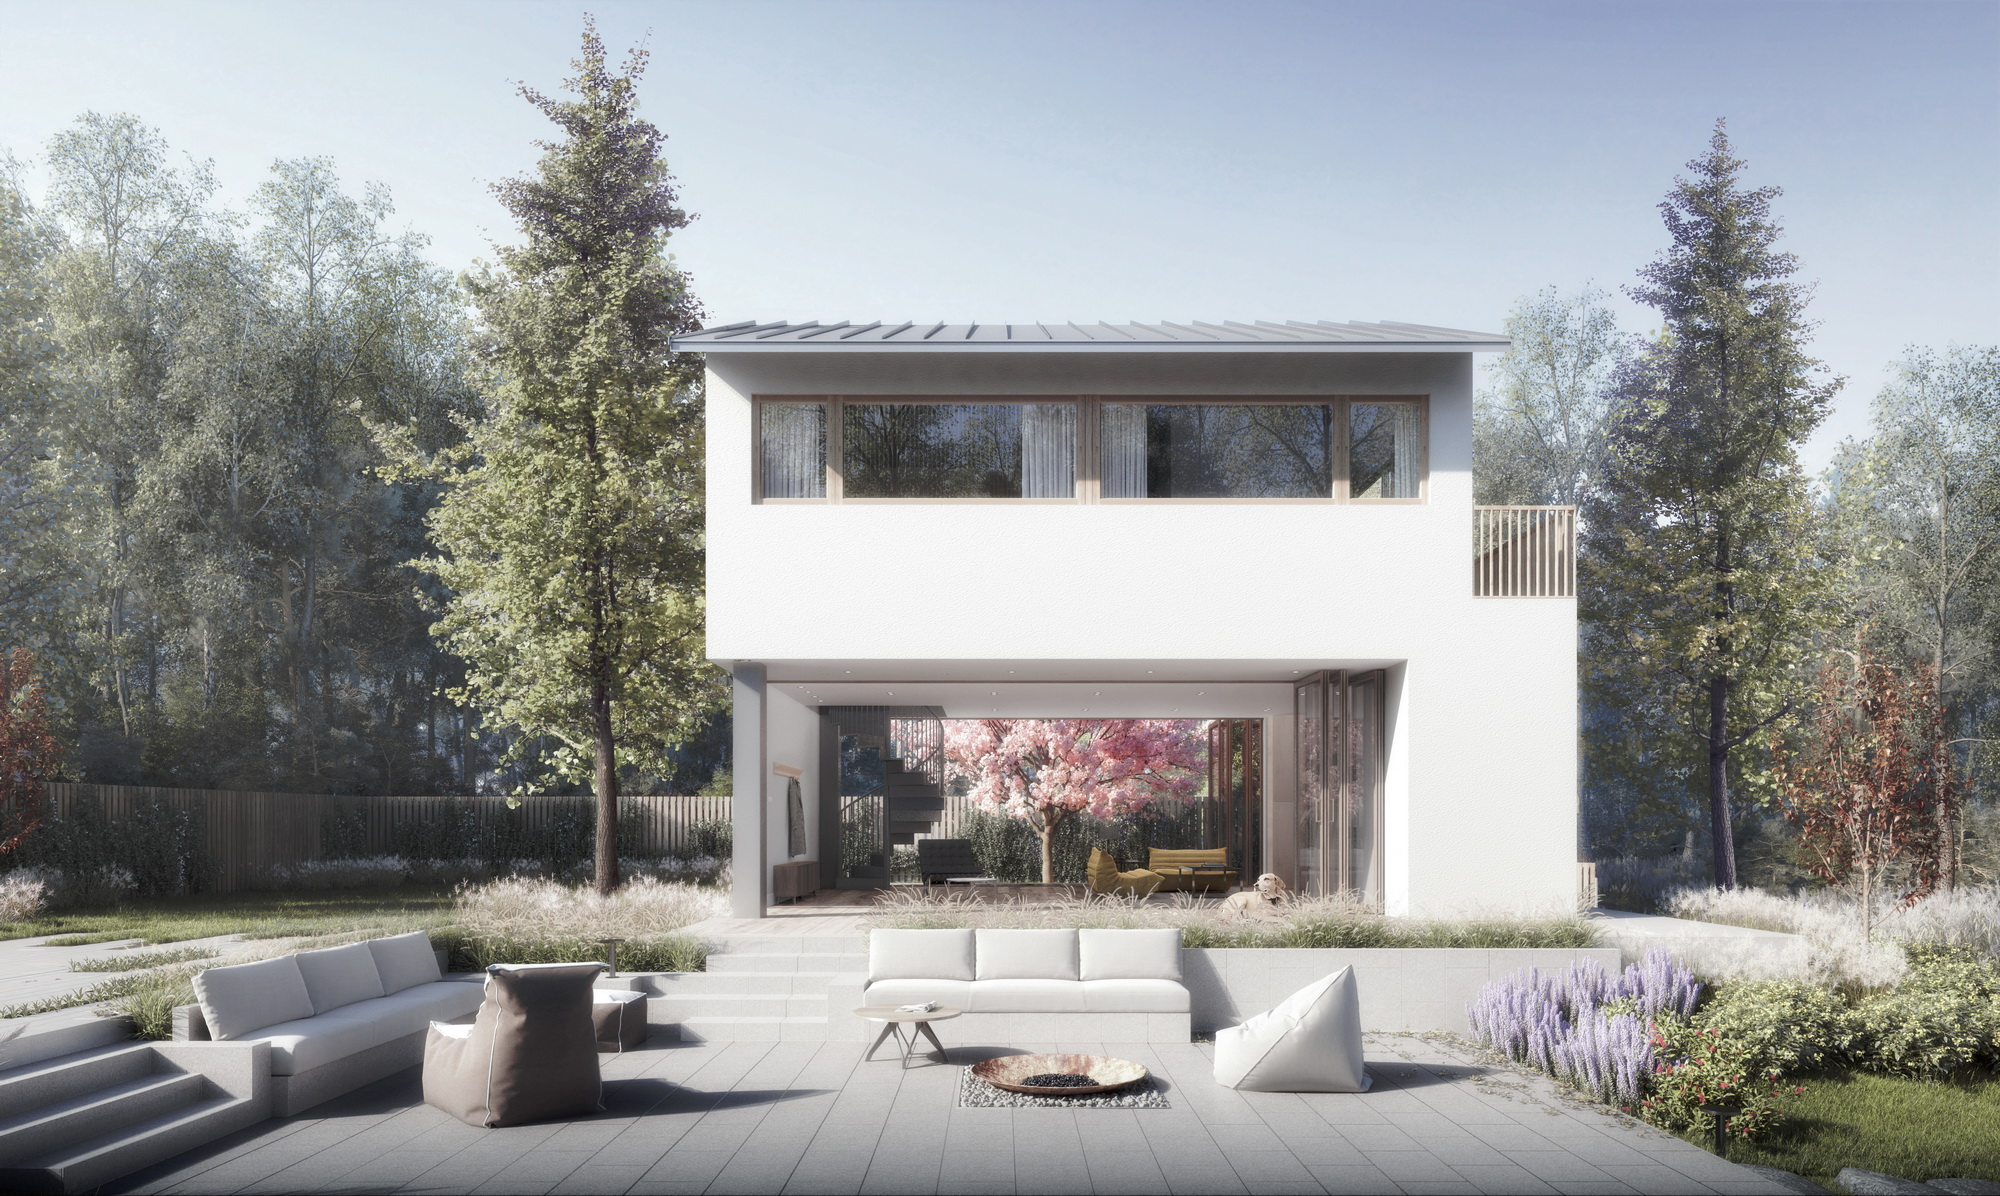 201812009-Y-design-house,view-c05_调整大小